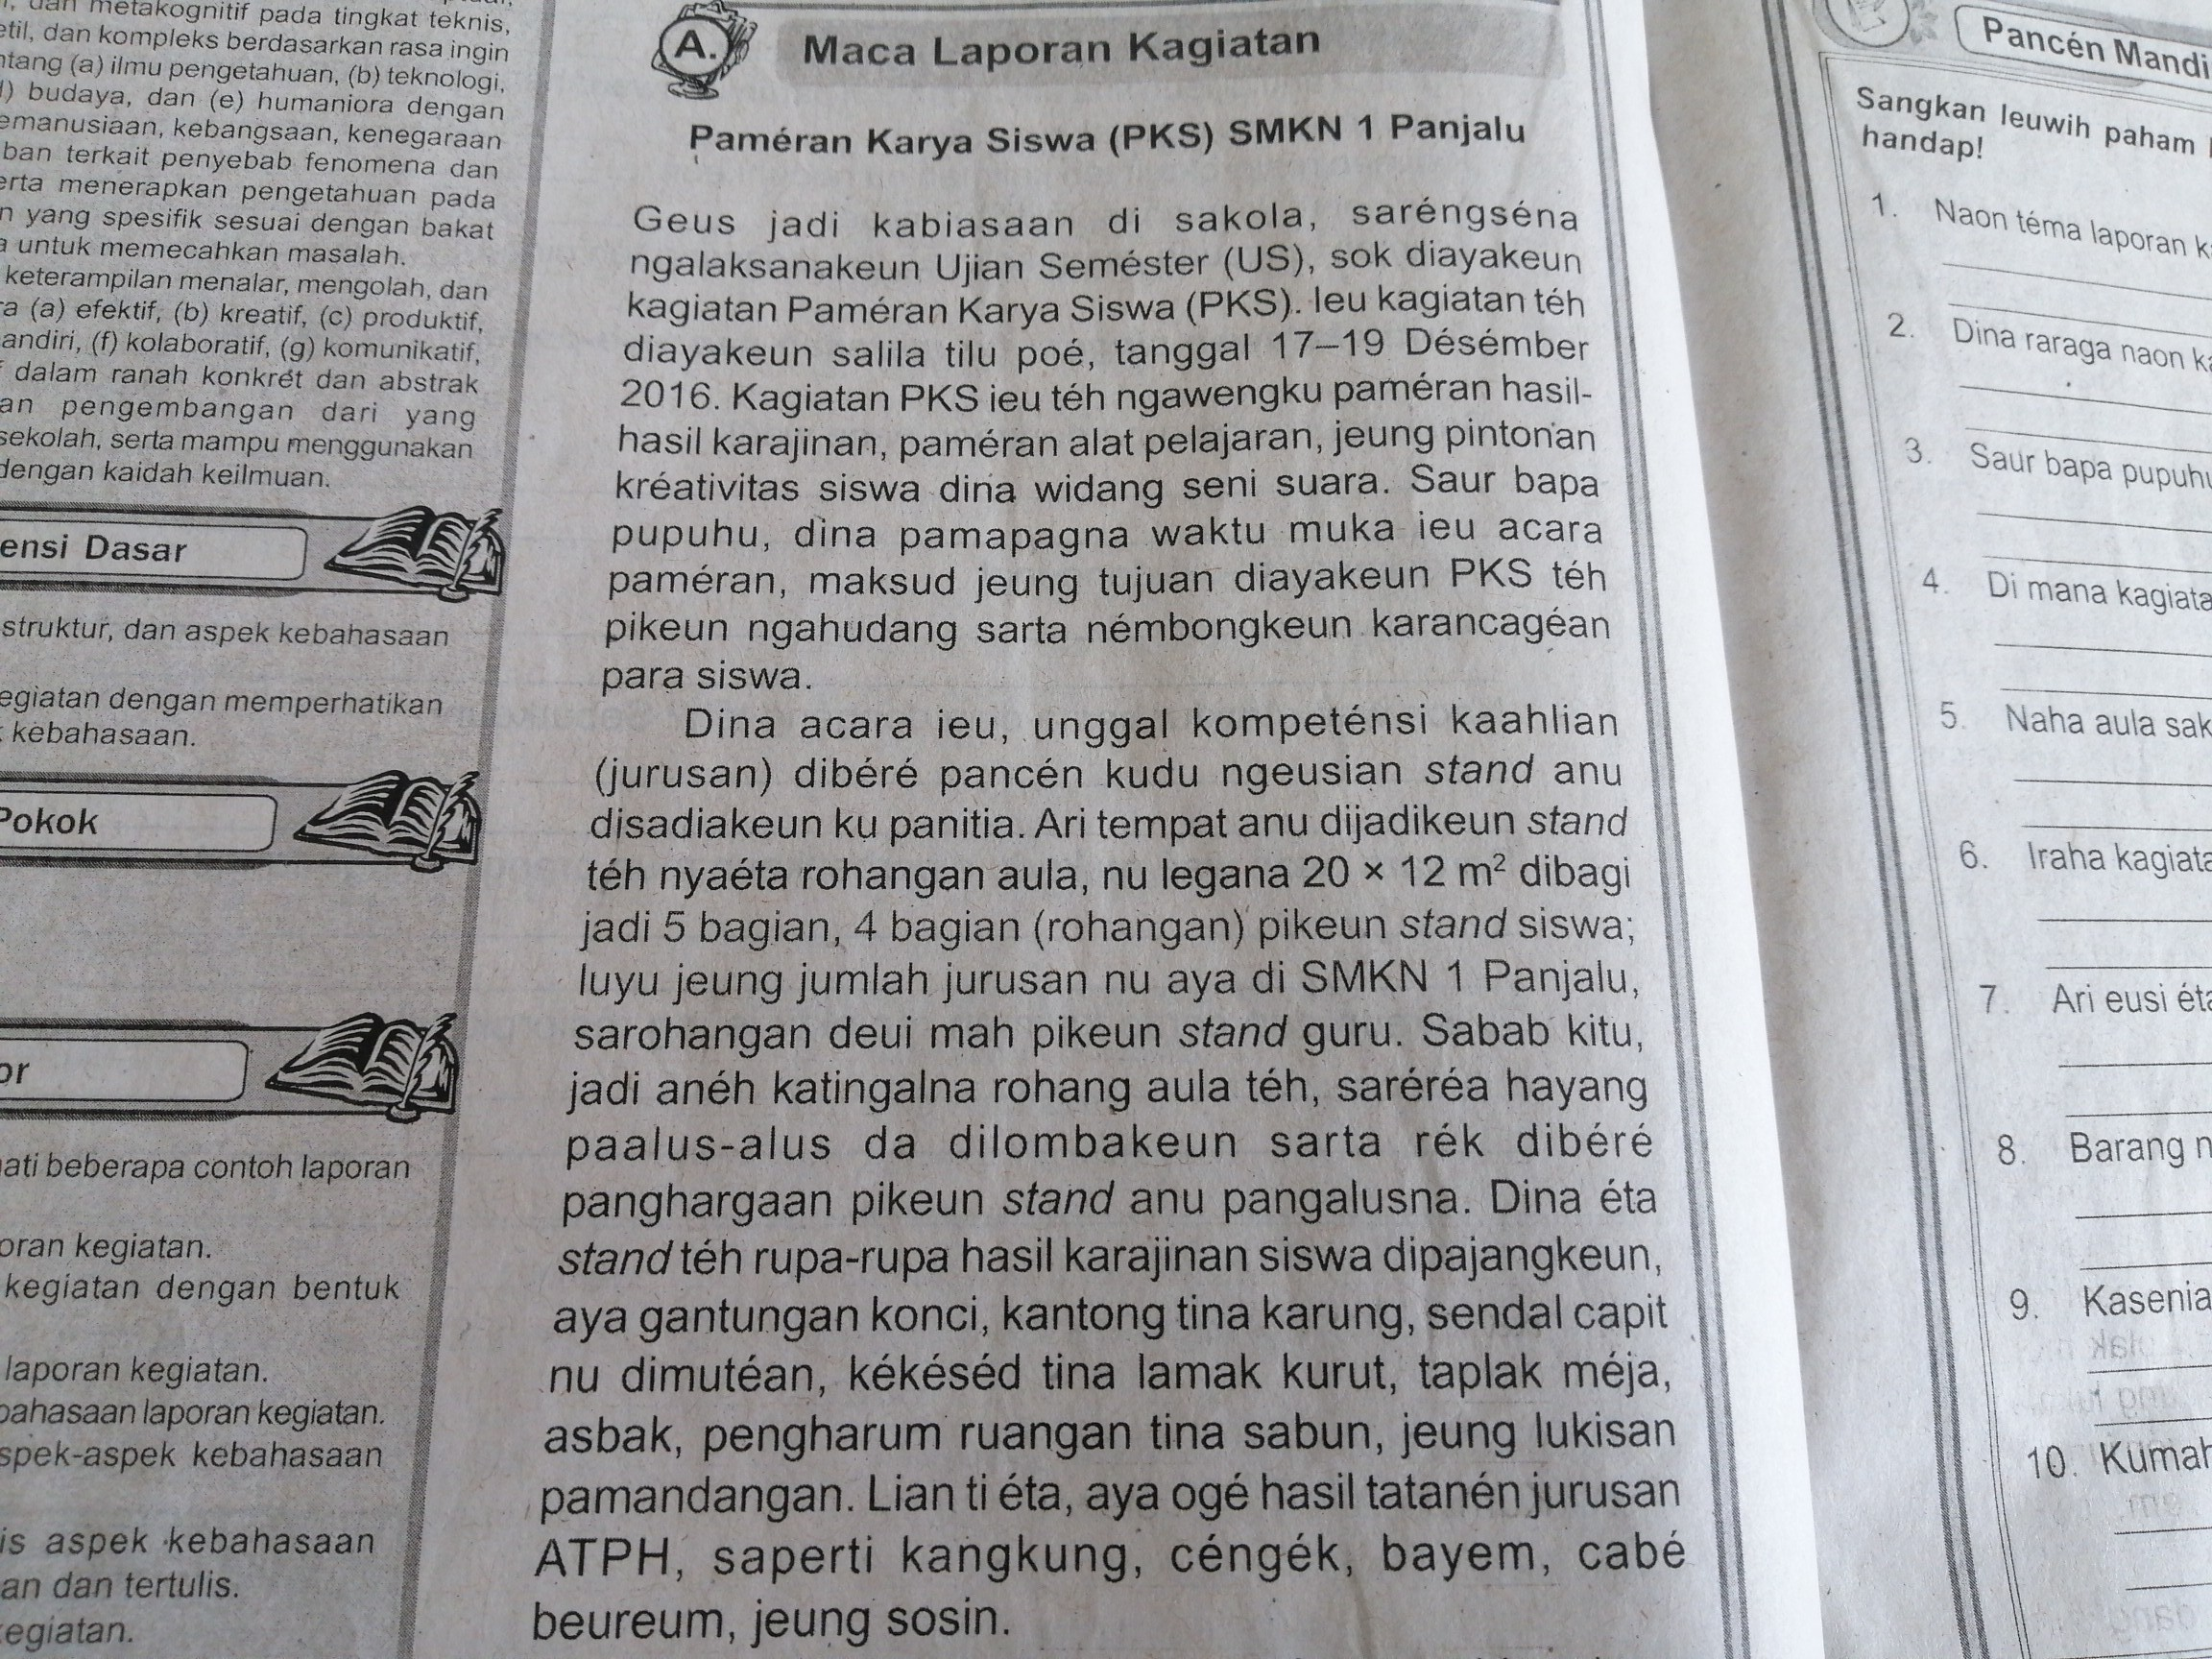 Tolong Terjemahin Ke Bahasa Indonesia Brainly Co Id